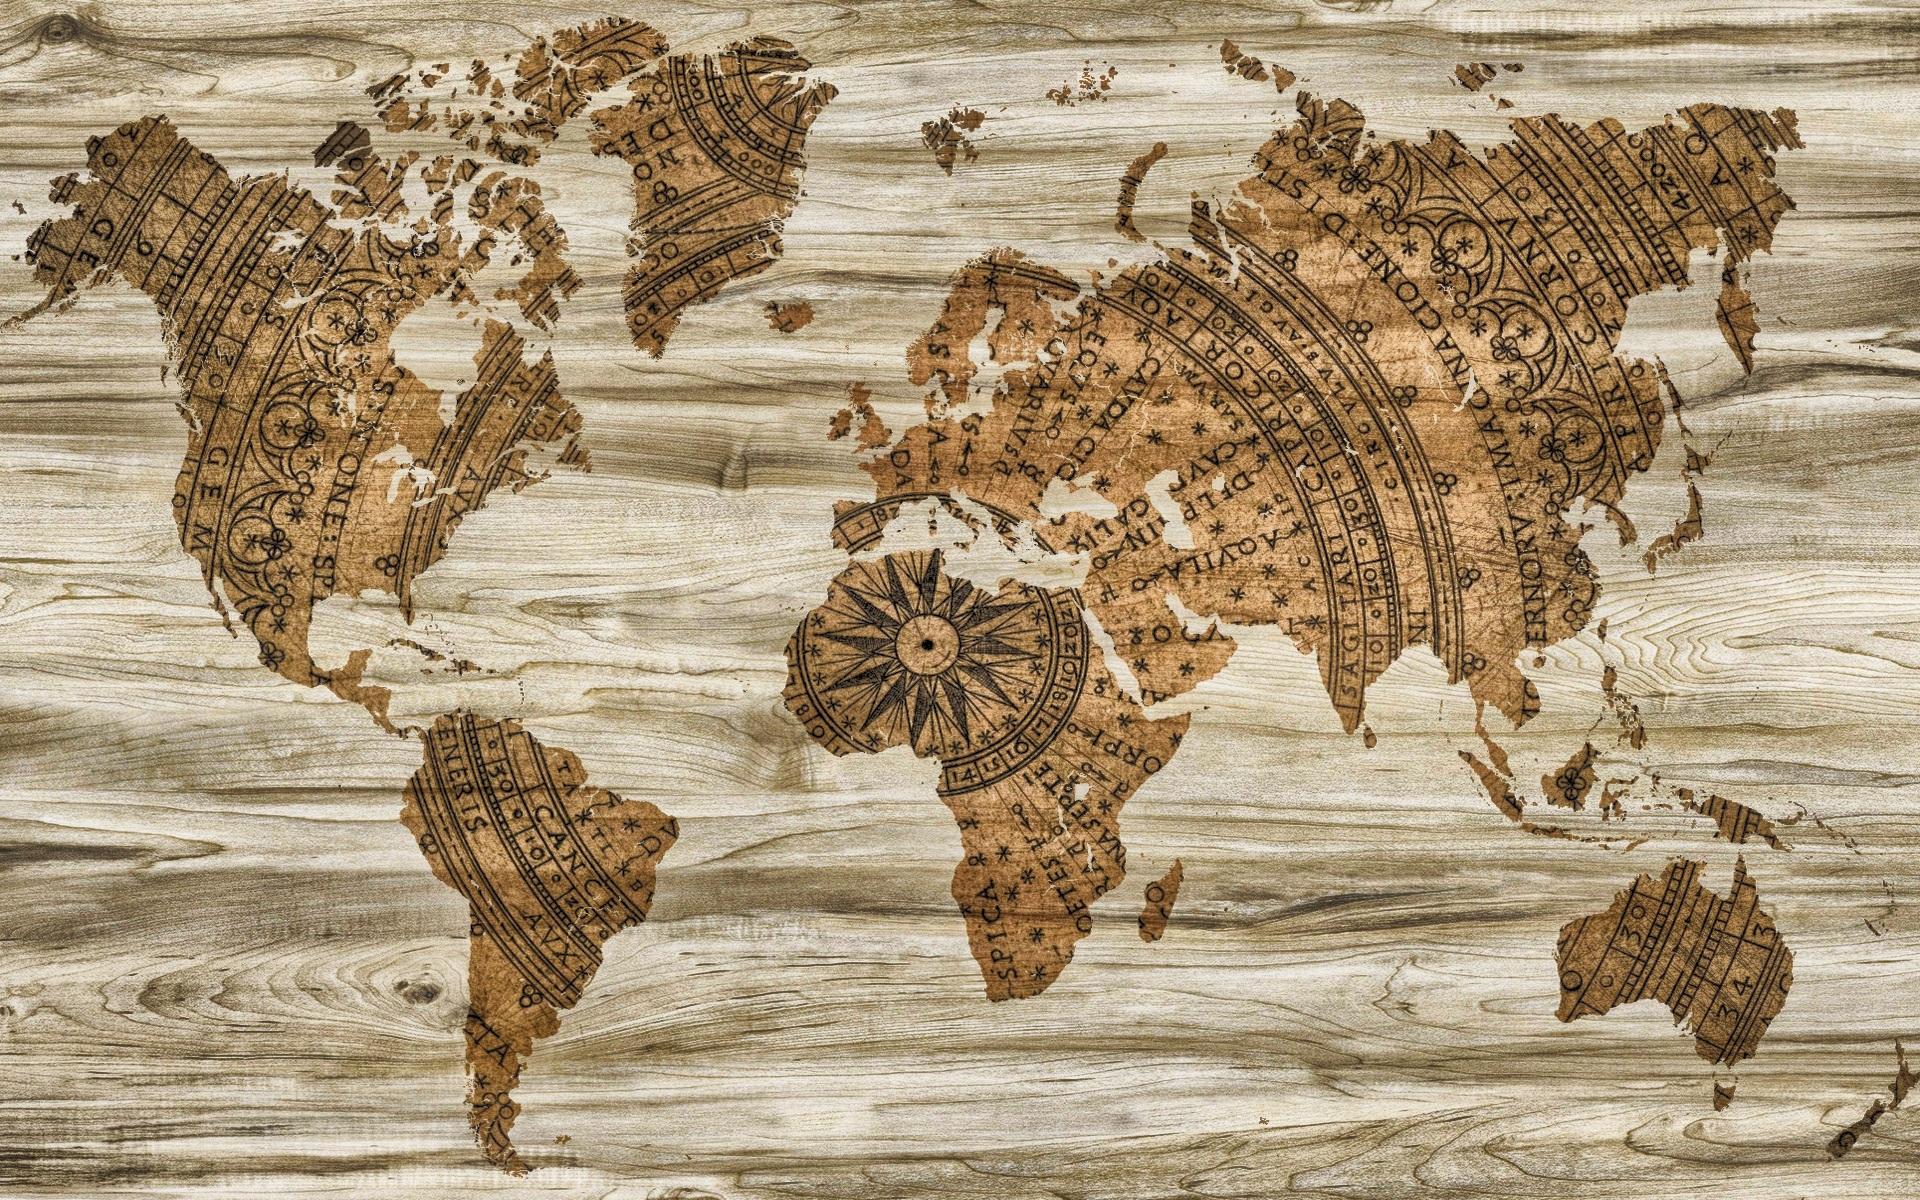 Fotos gratis madera textura br jula papel mapa for Mapa del mundo decoracion